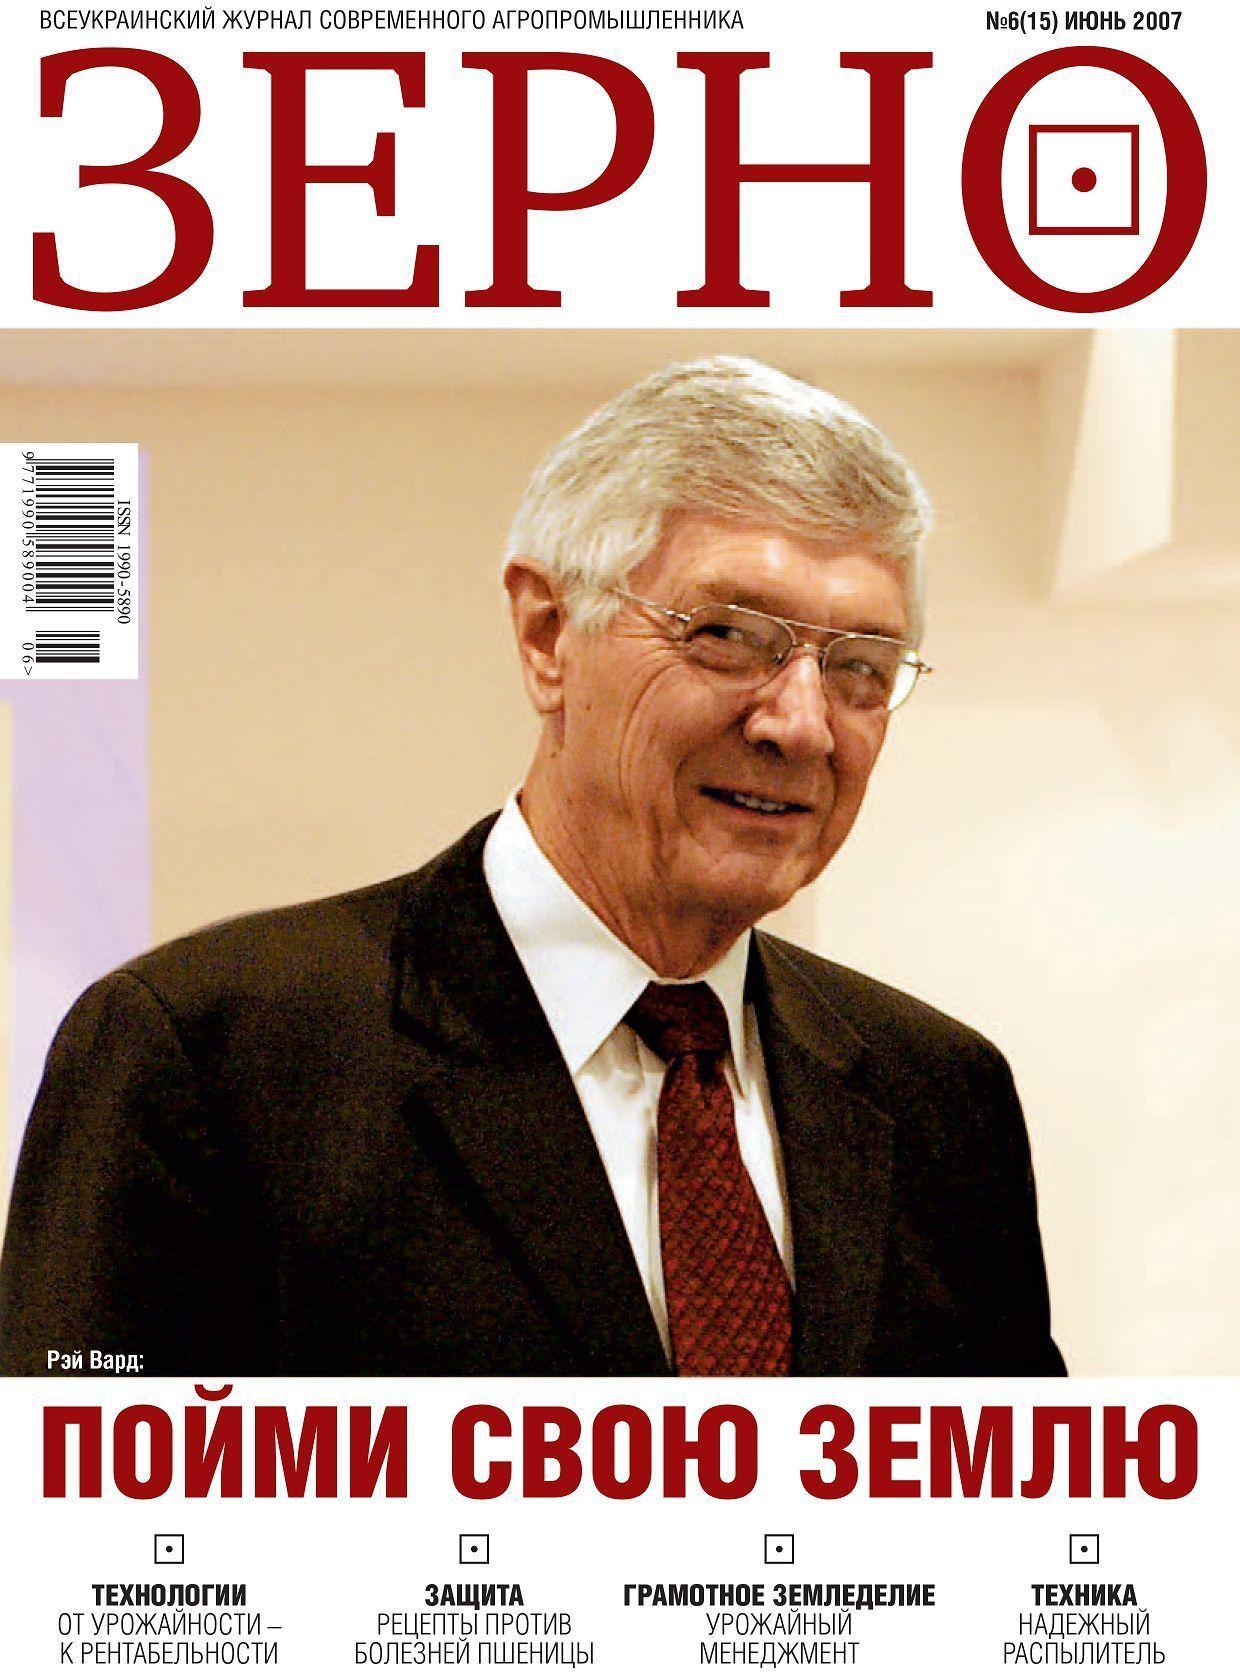 Июнь 2007 год